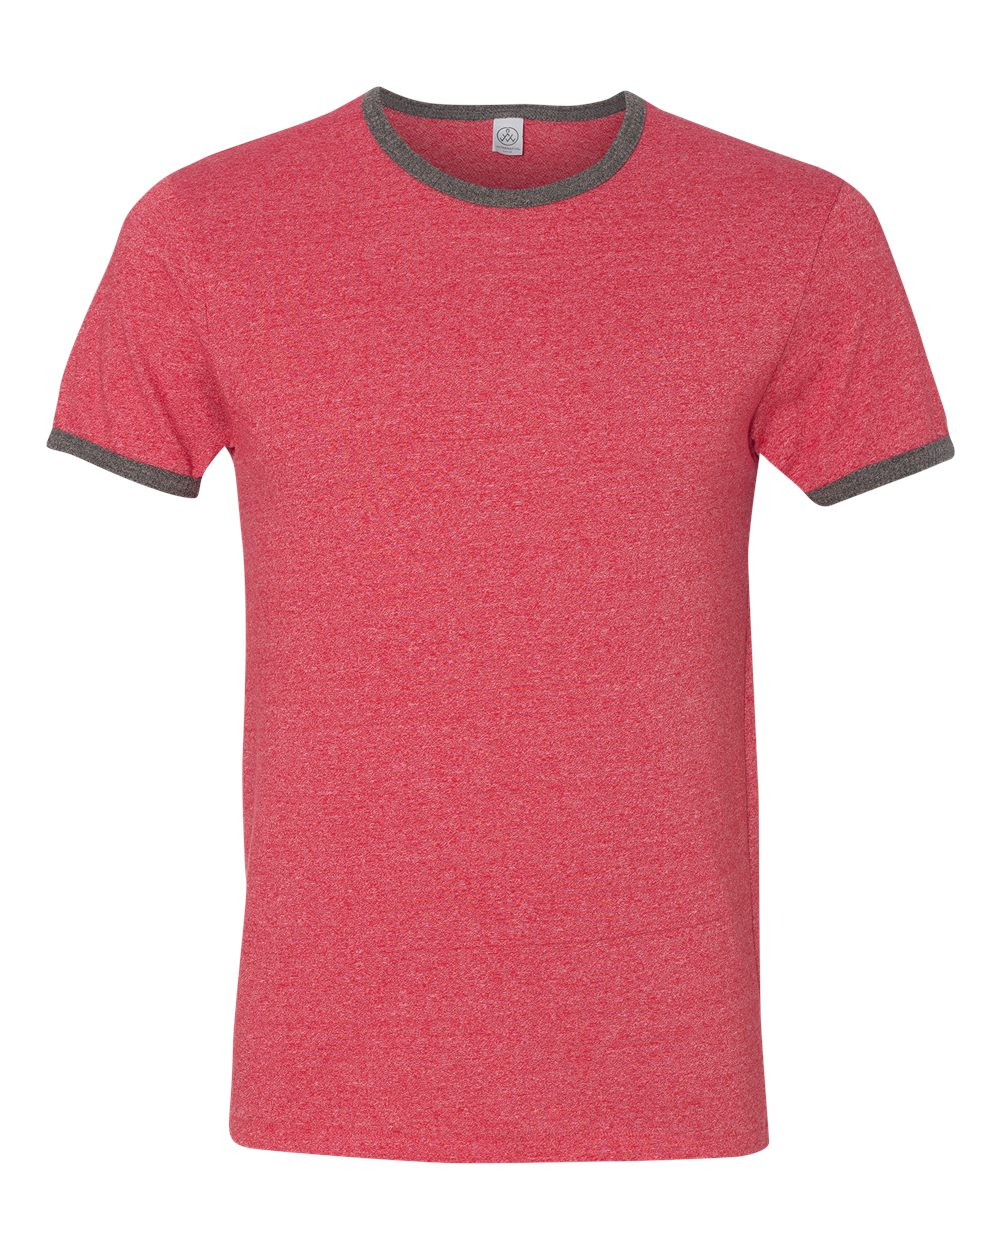 Custom ringer t shirt kirkwood trading company for Custom t shirt company